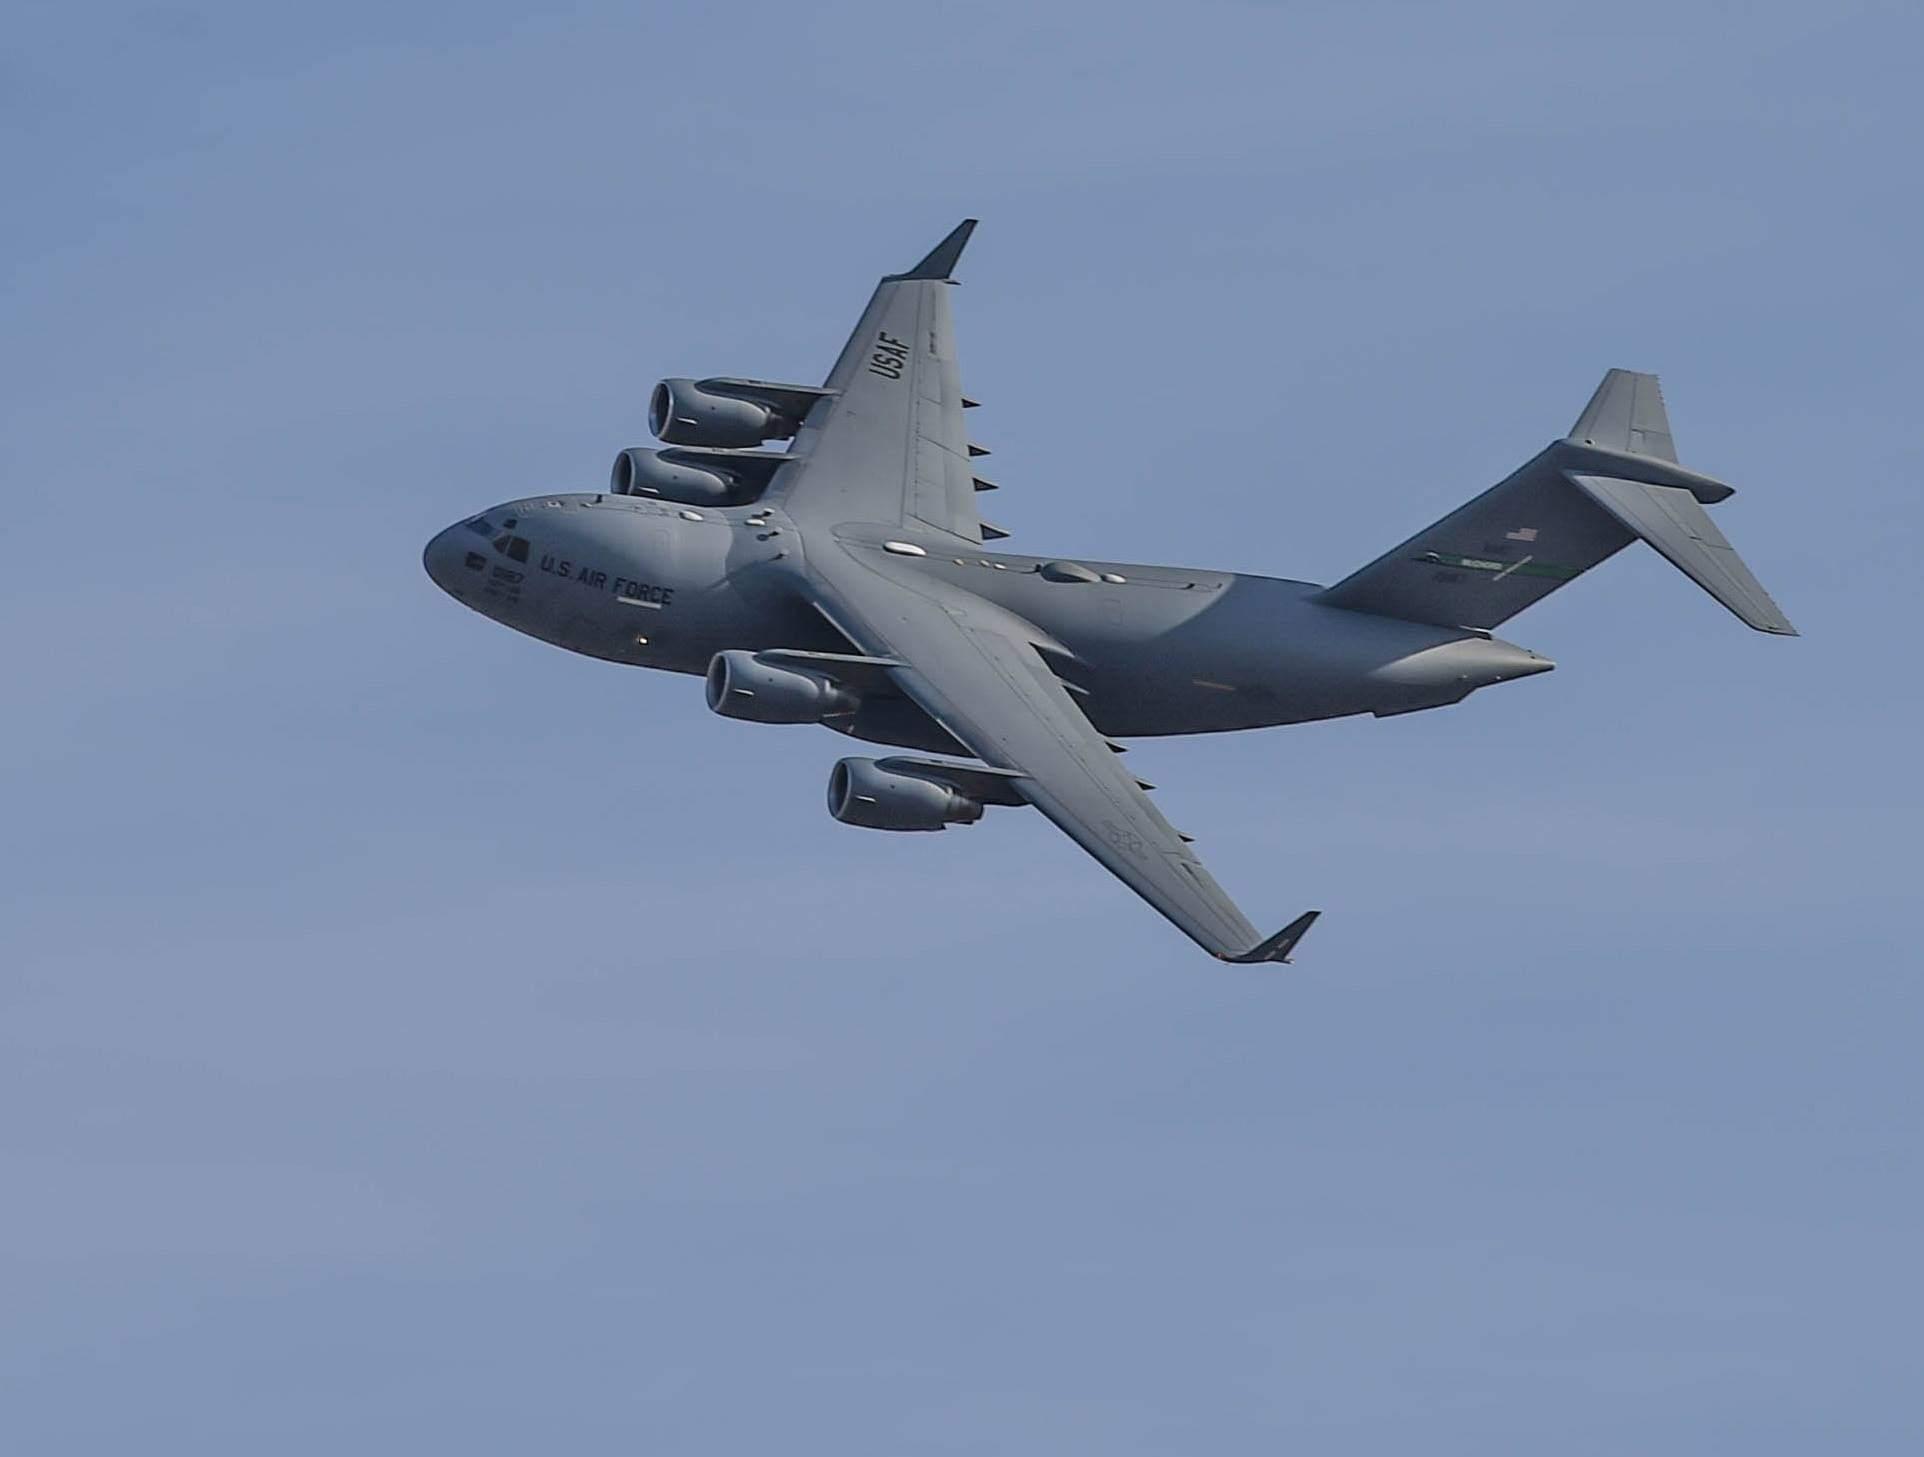 C-17, air force plane, c-17 flying, military plane